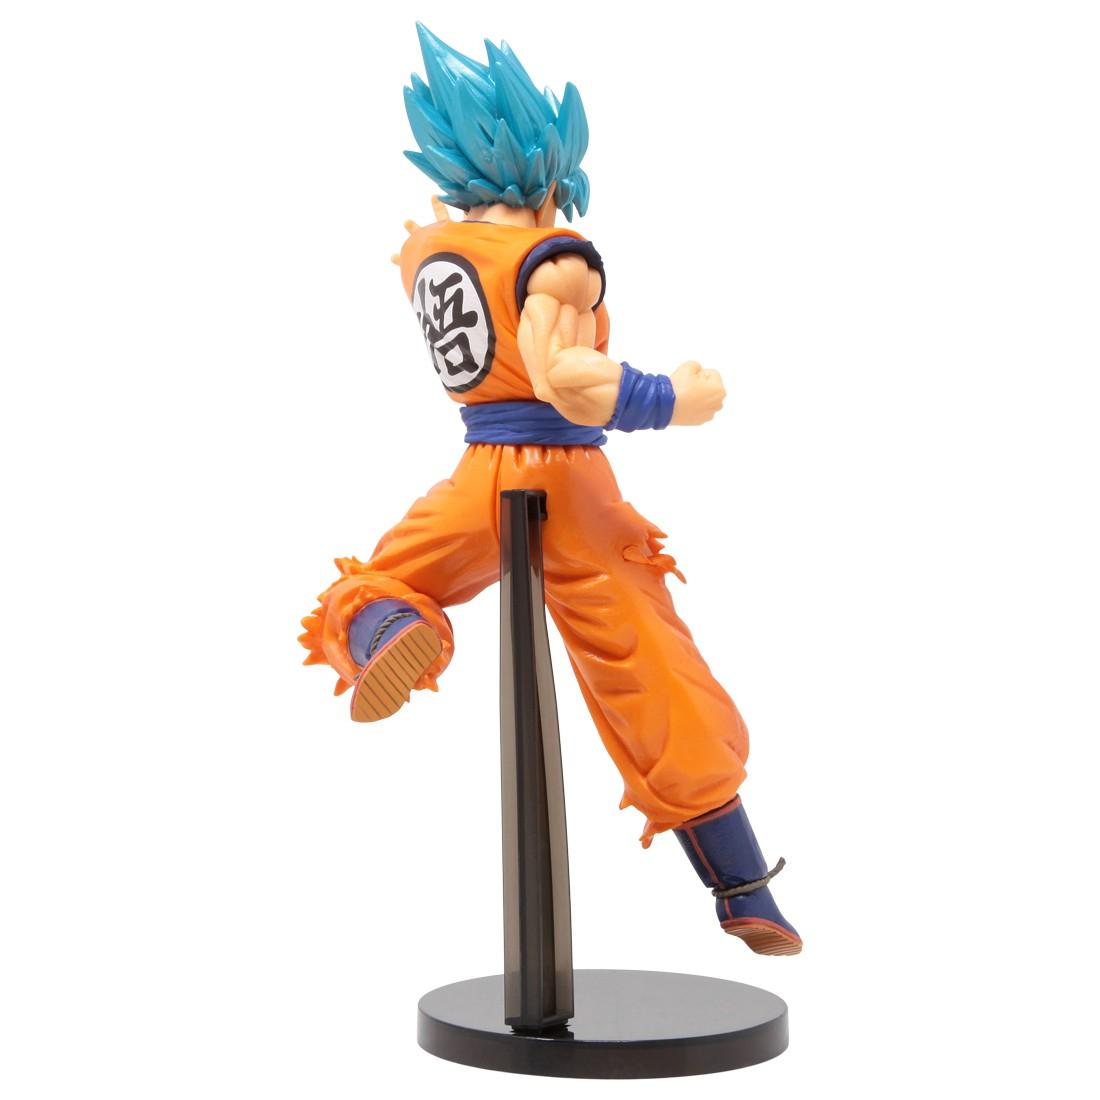 Banpresto Dragon Ball Super Chosenshi Retsuden 2 Vol. 4 Super Saiyan God Super Saiyan Son Goku